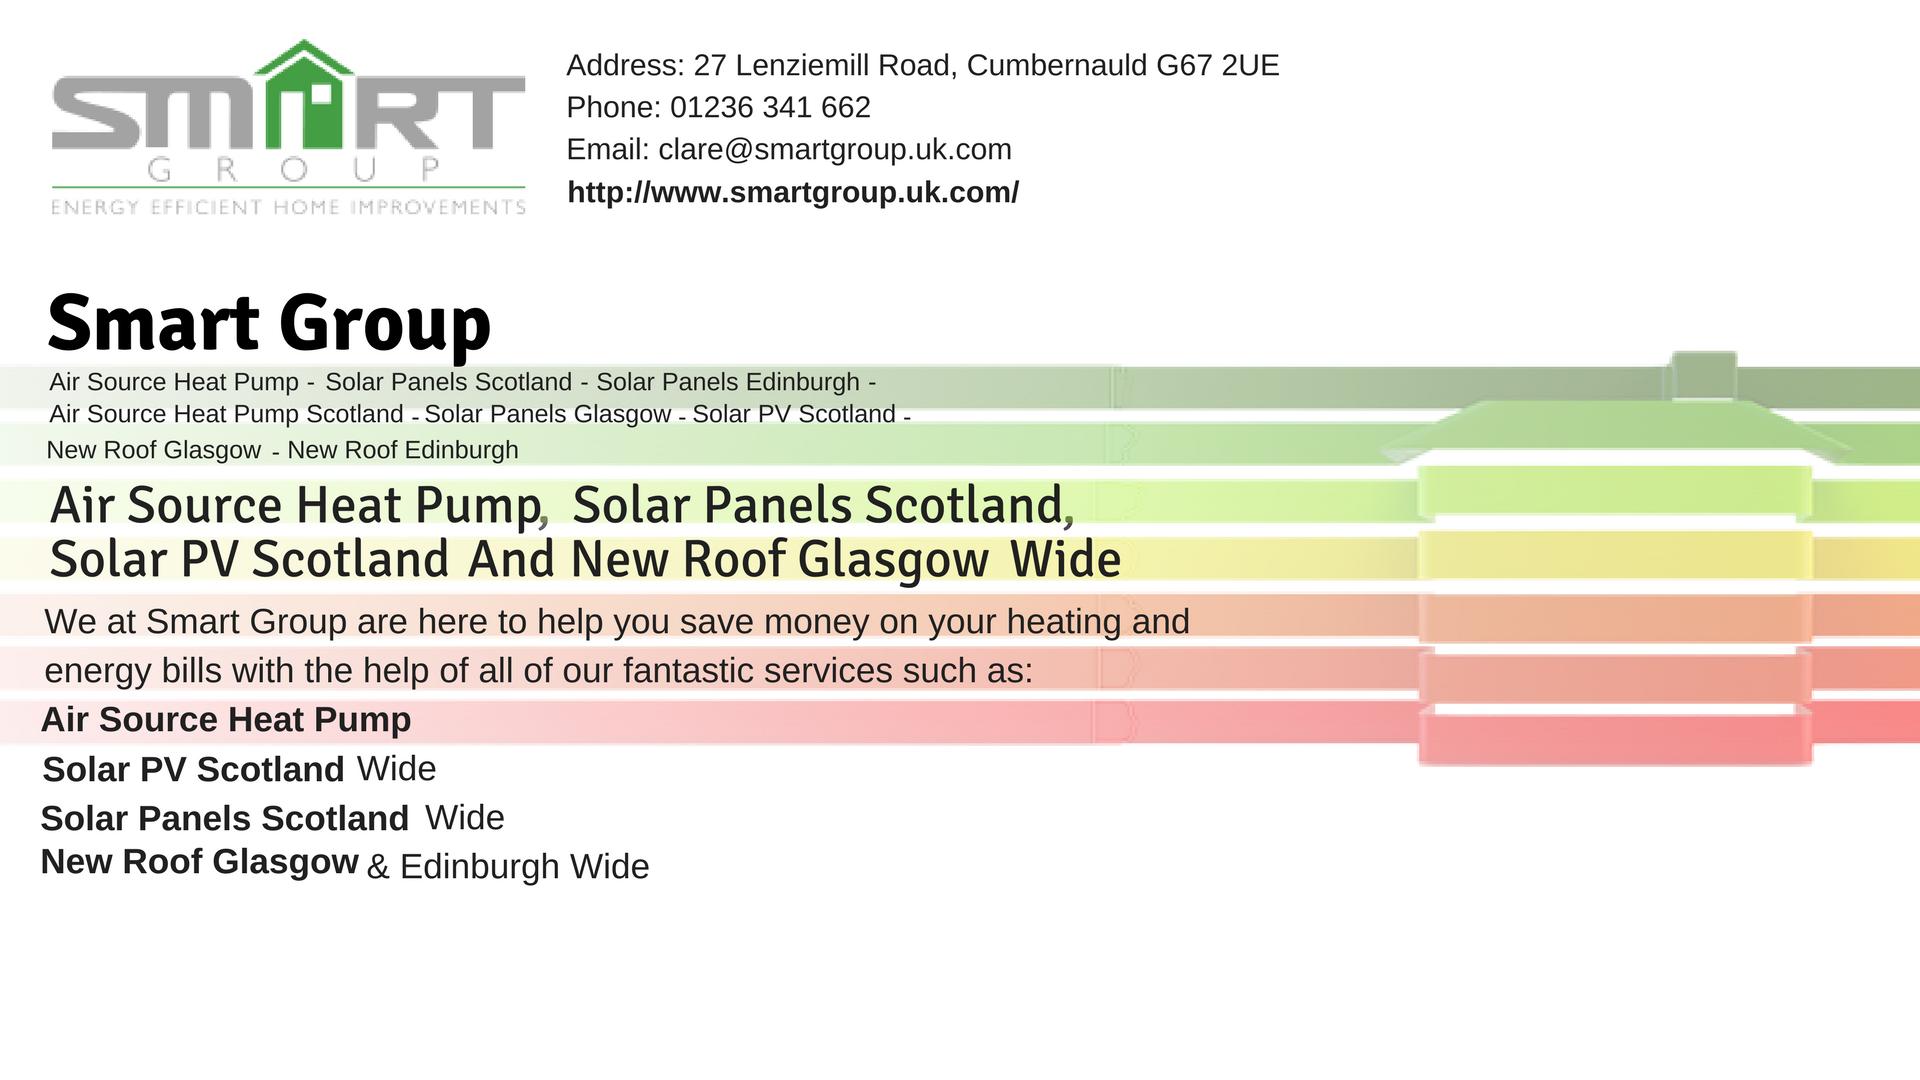 Air Source Heat Pumps Glasgow, Edinburgh Smart Group